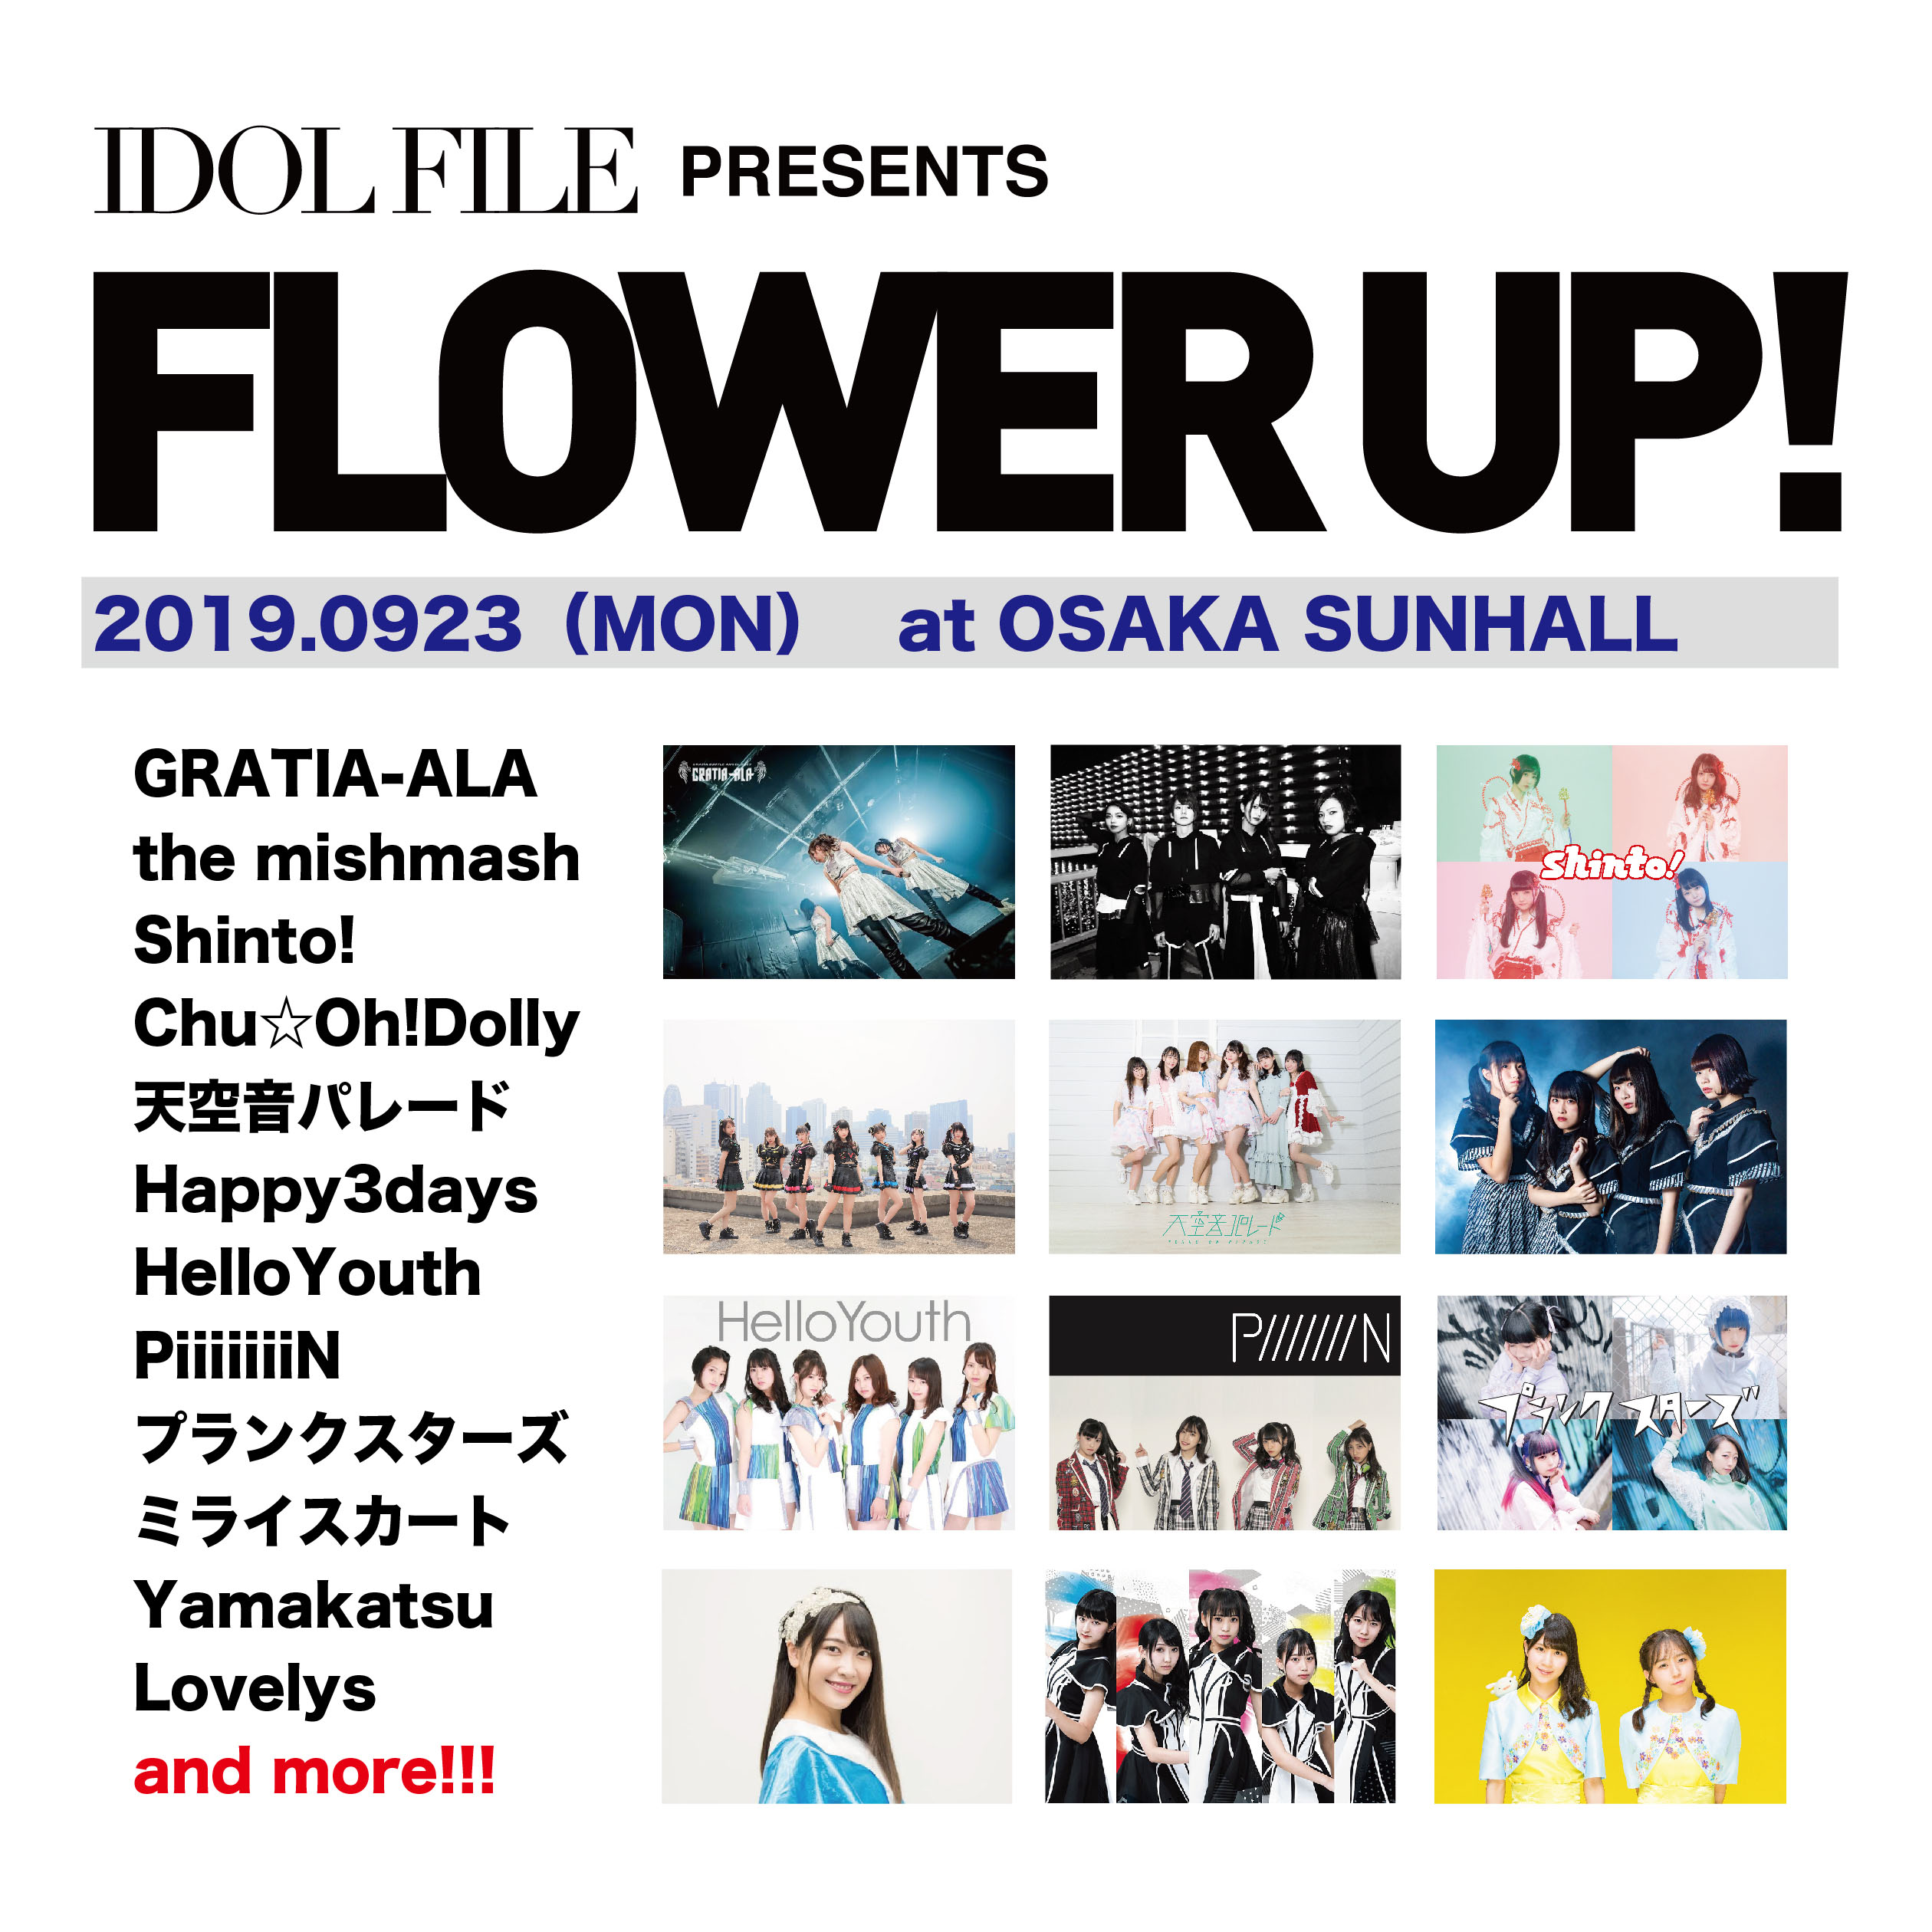 FLOWER UP!